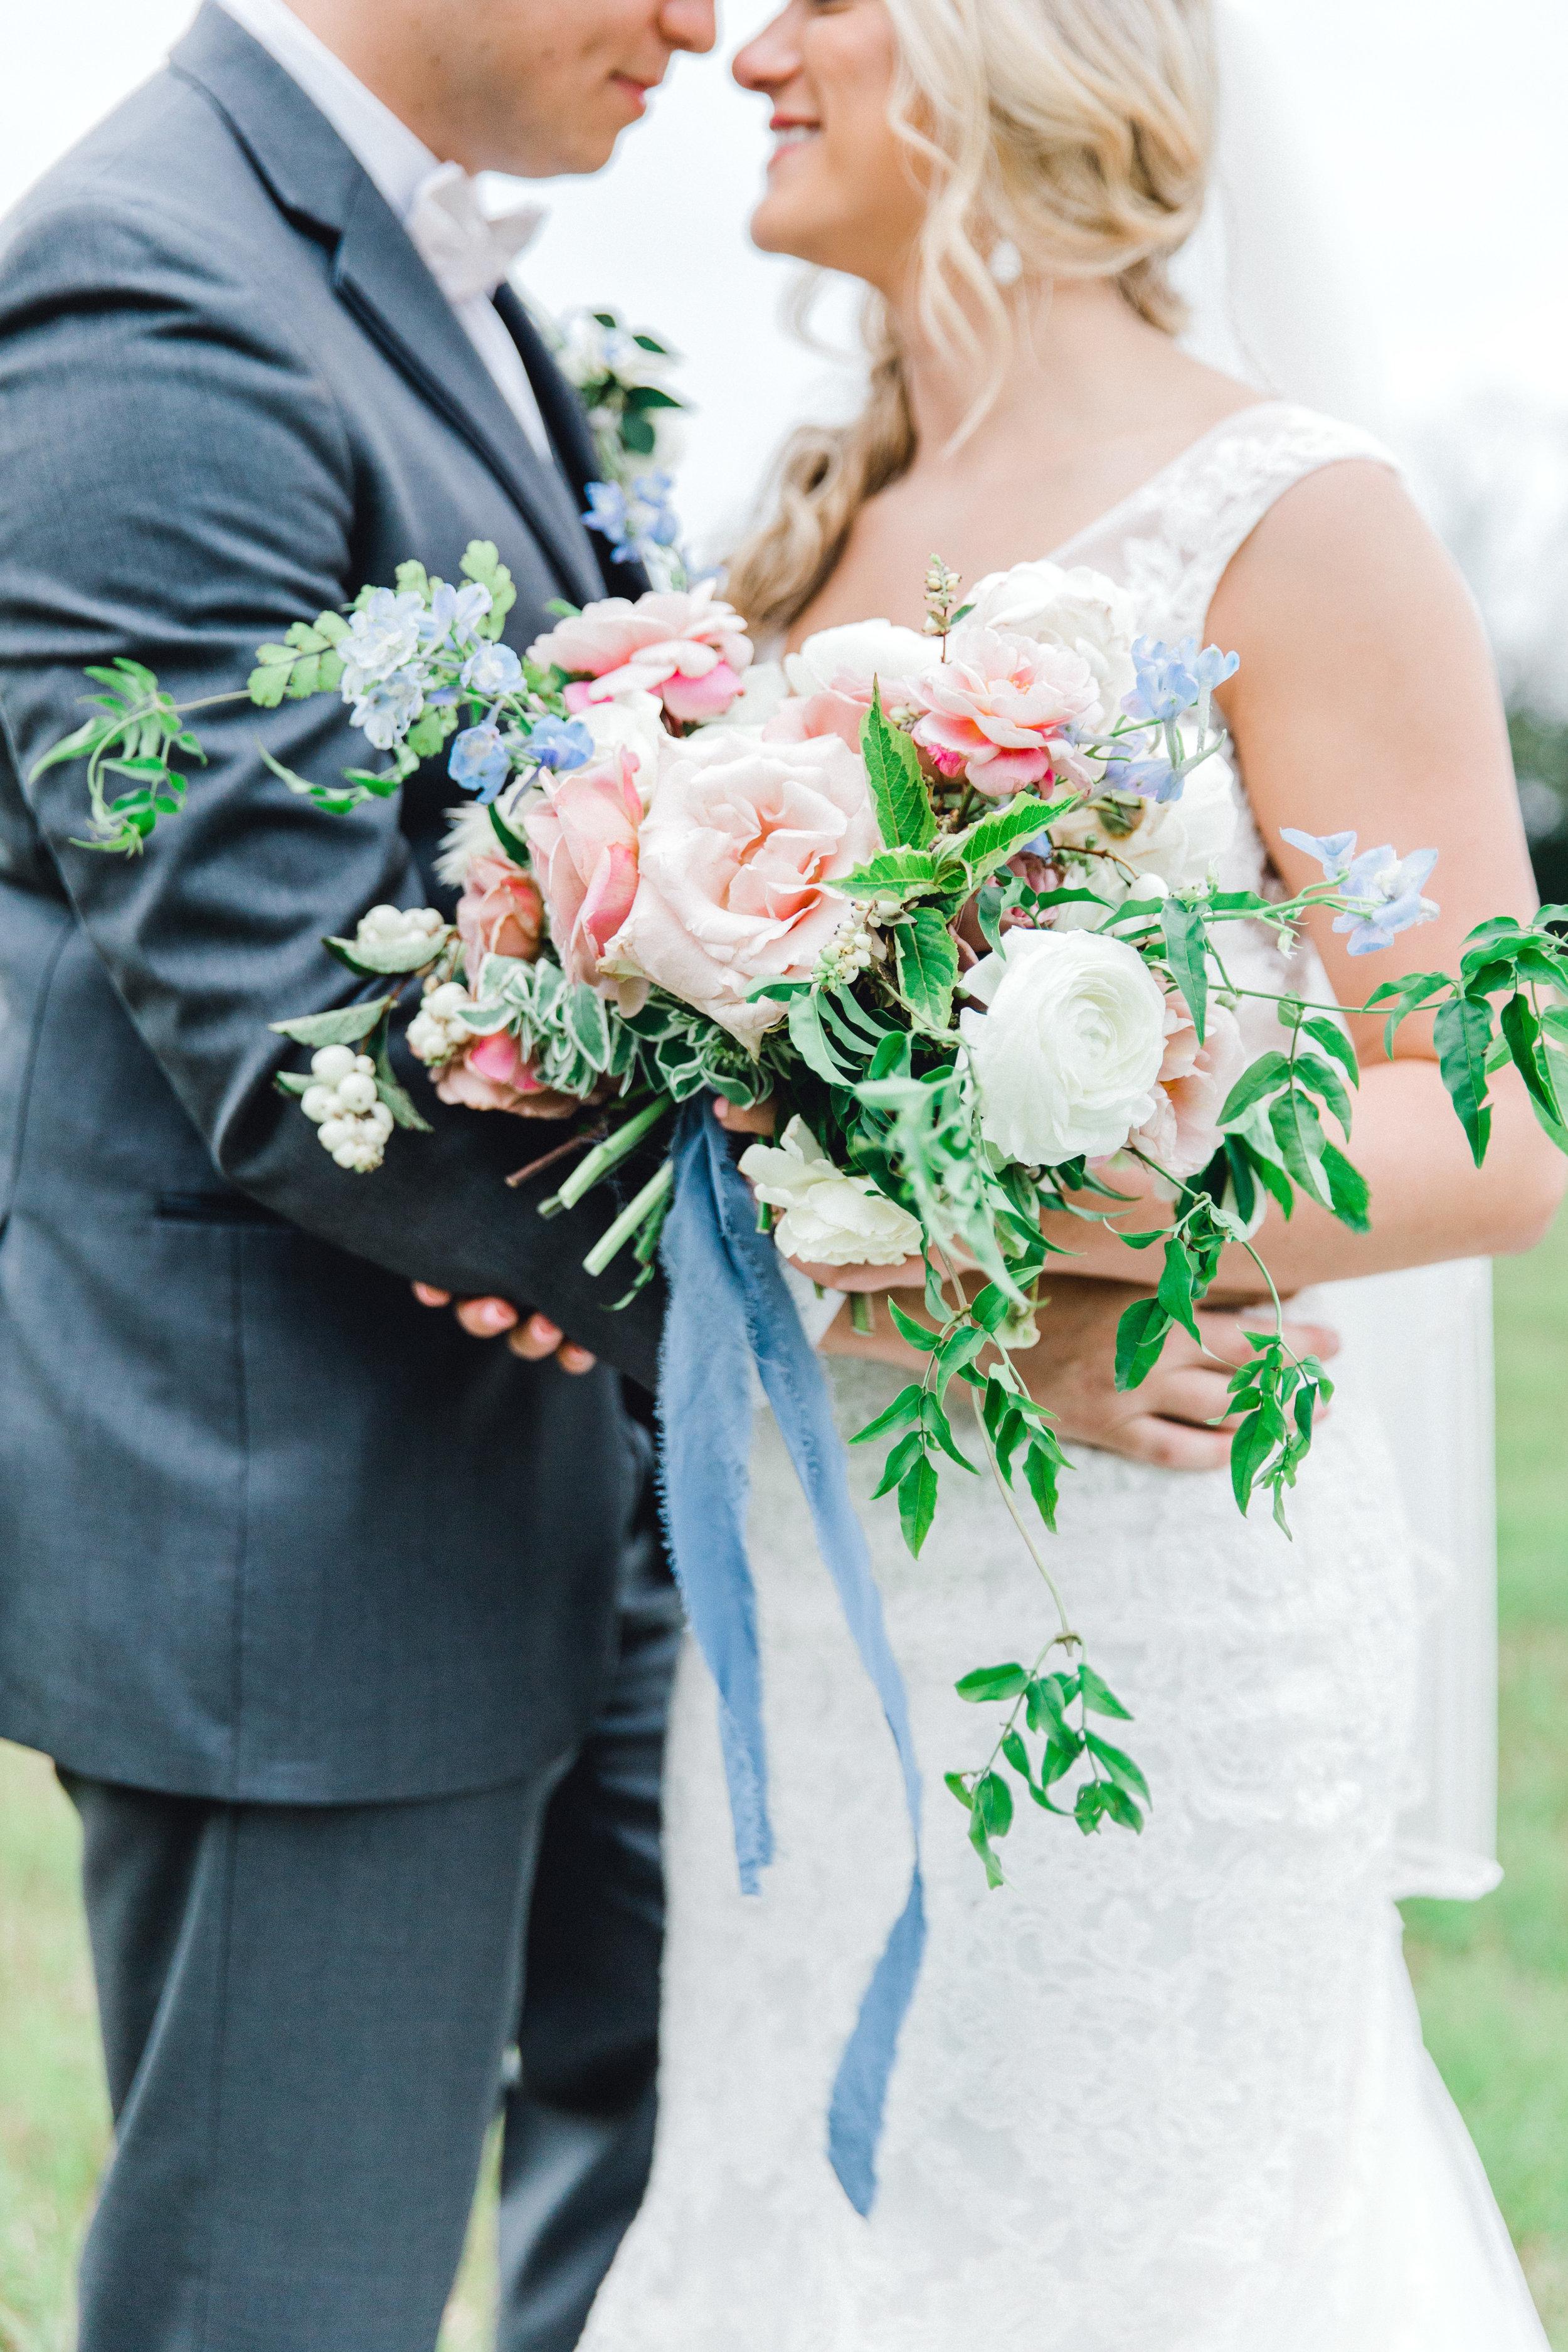 Paige-Mercer-Photography-Florida-Wedding-Photographer-Alyssa&Drew-65.jpg